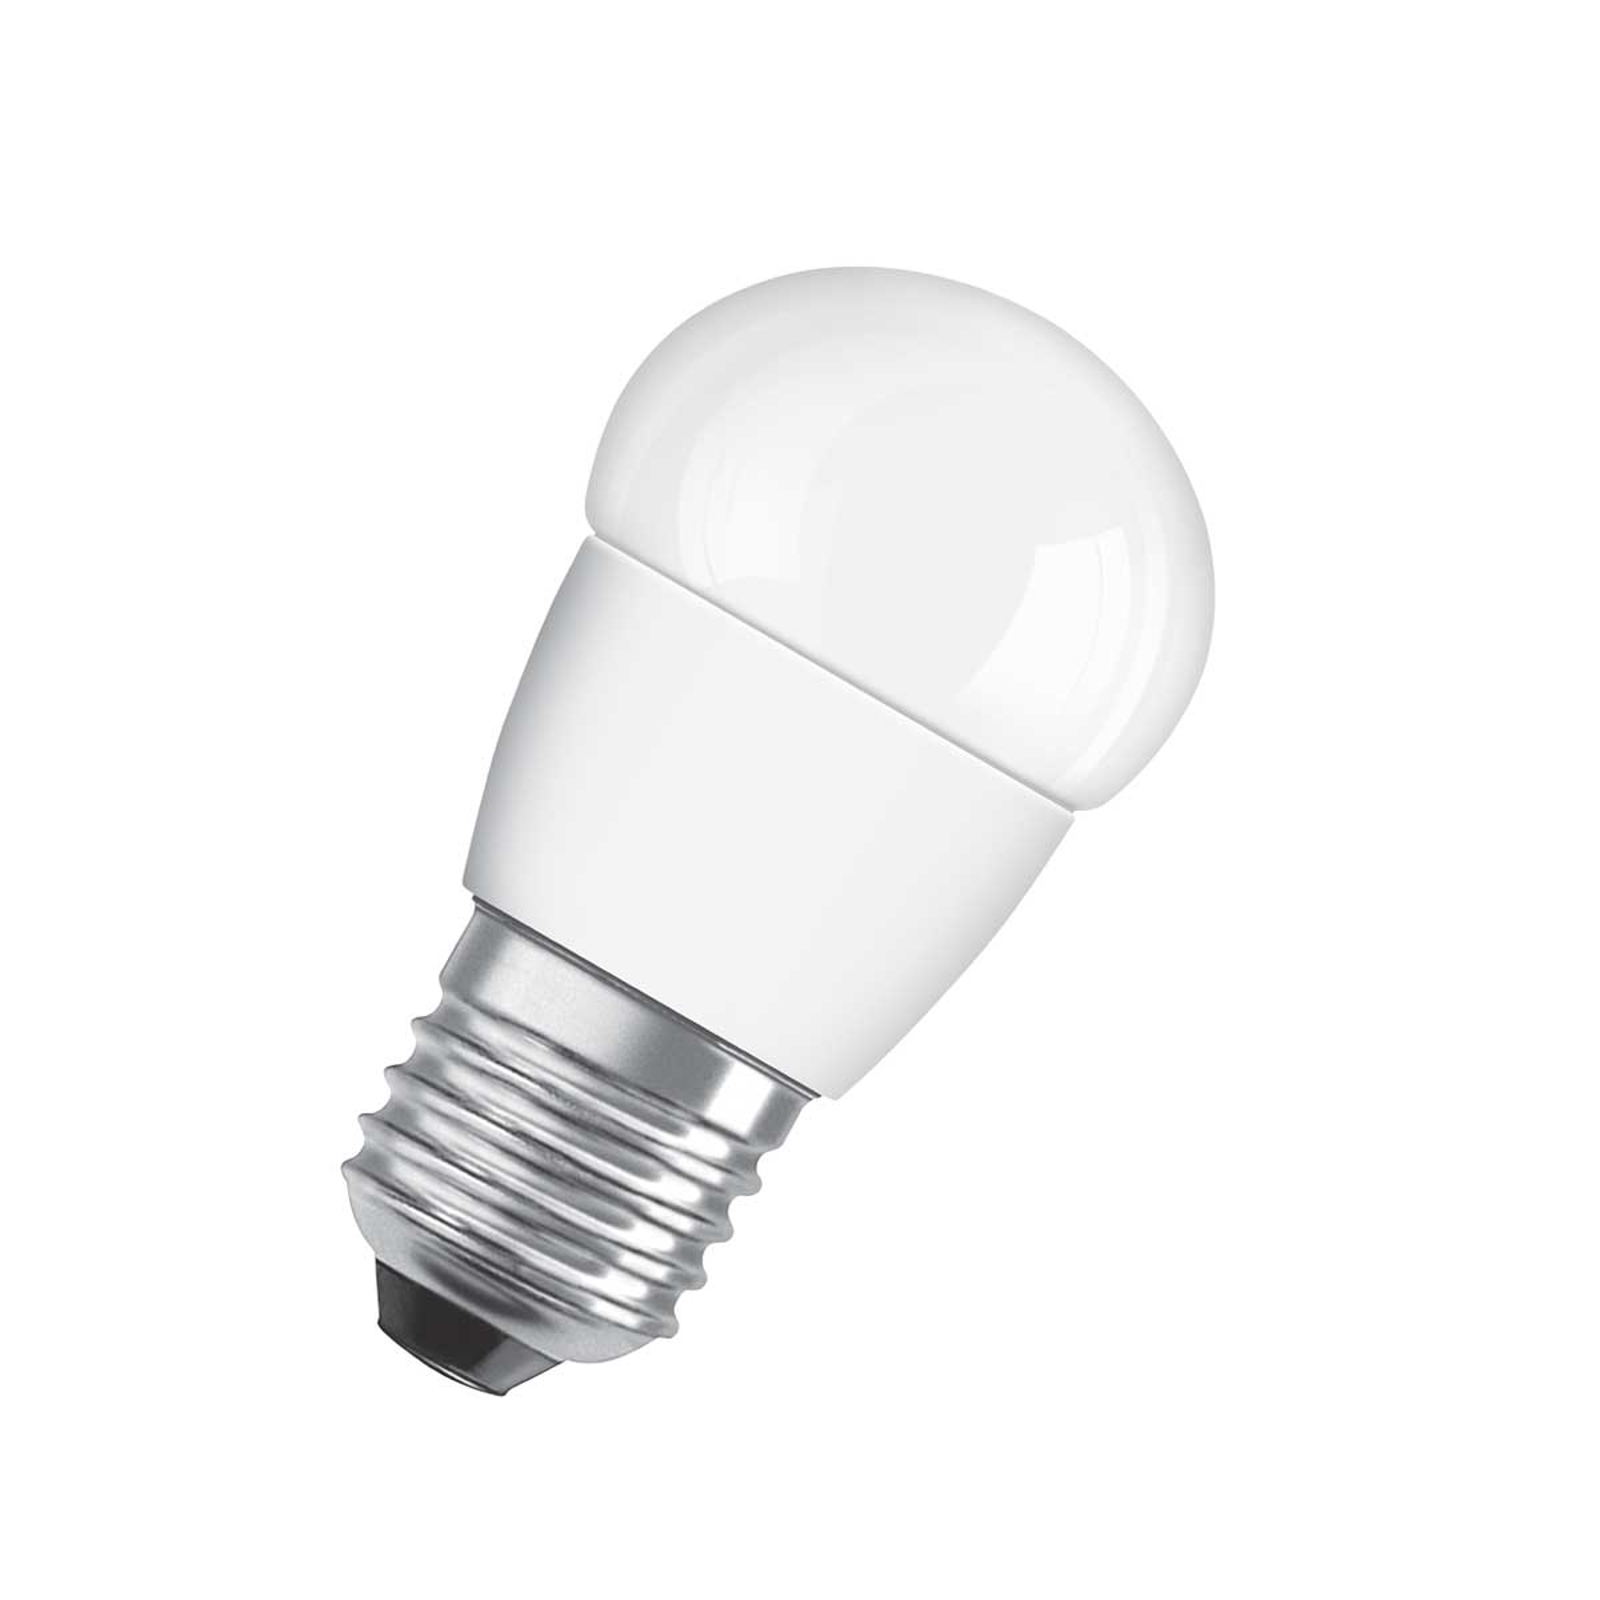 OSRAM LED-Tropfenlampe E27 5,5W 827 Star matt